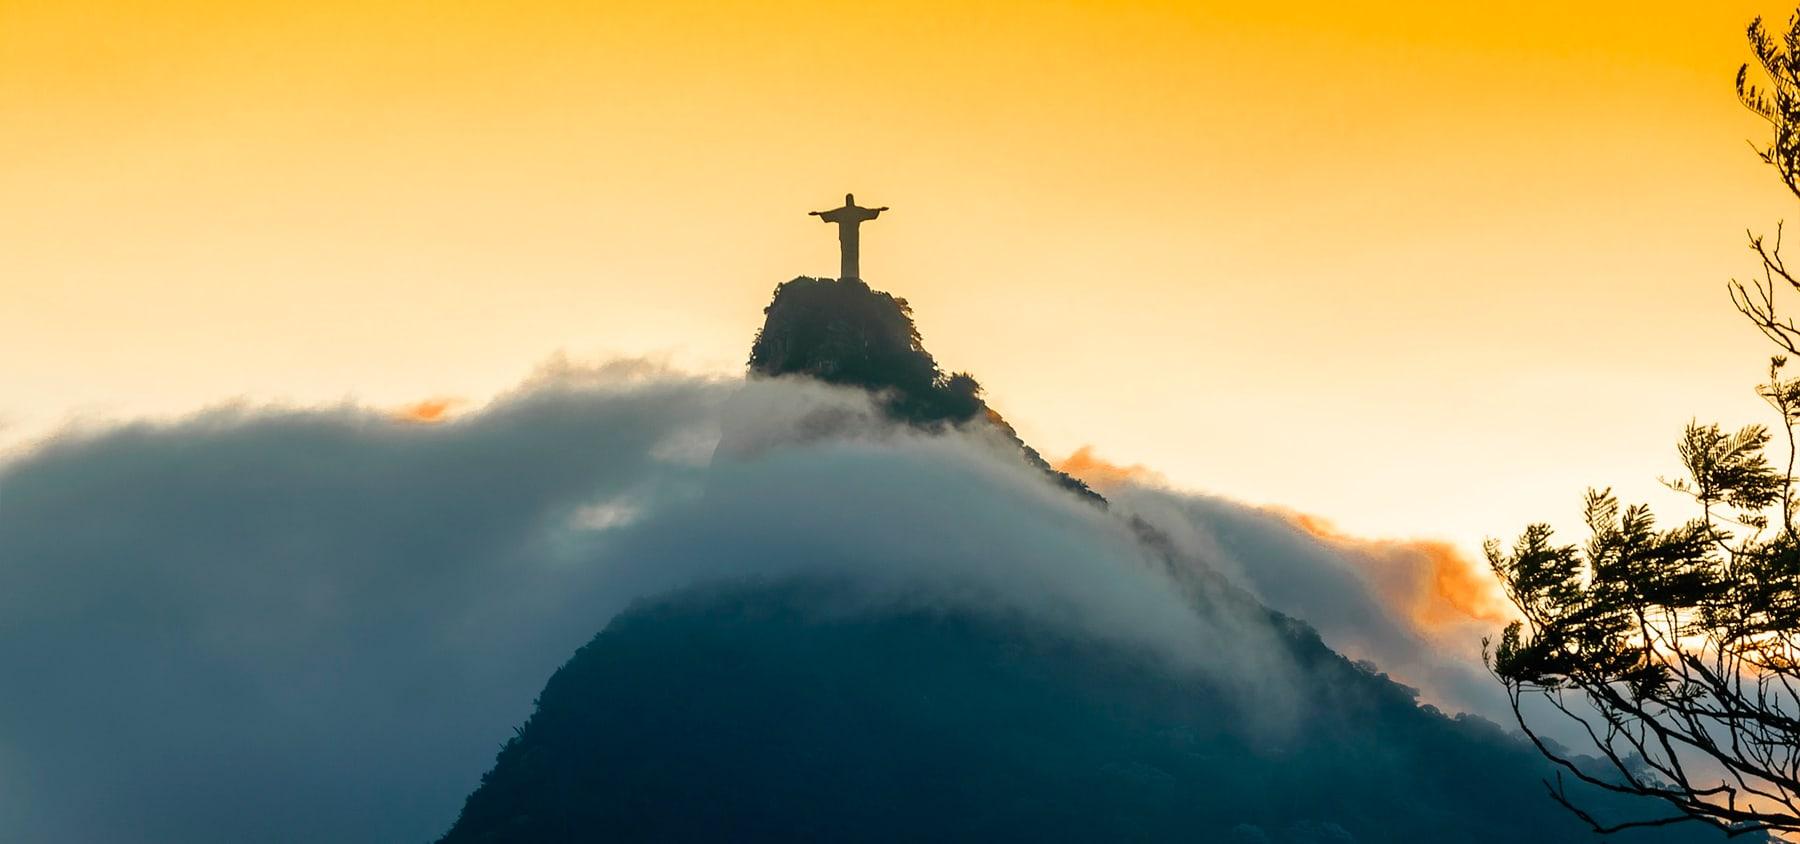 immagine per brasile tour classico